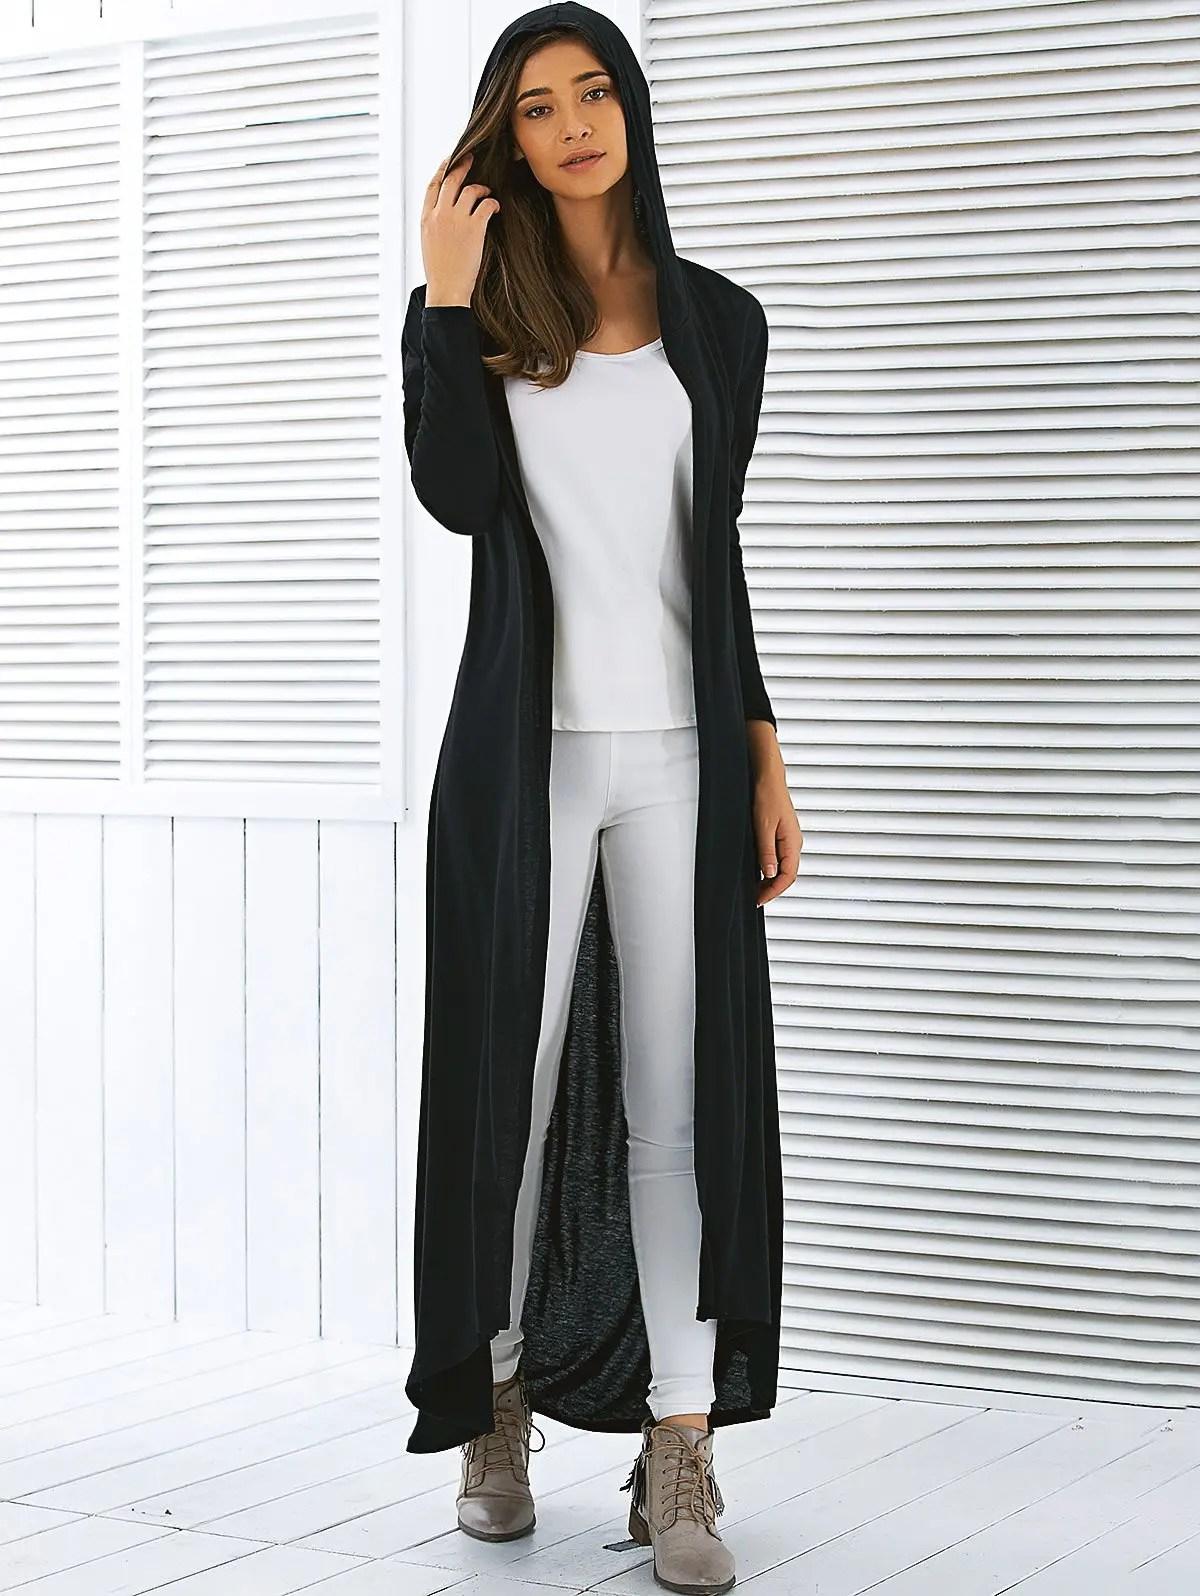 2018 Hooded Maxi Long Duster Cardigan In Black Xl